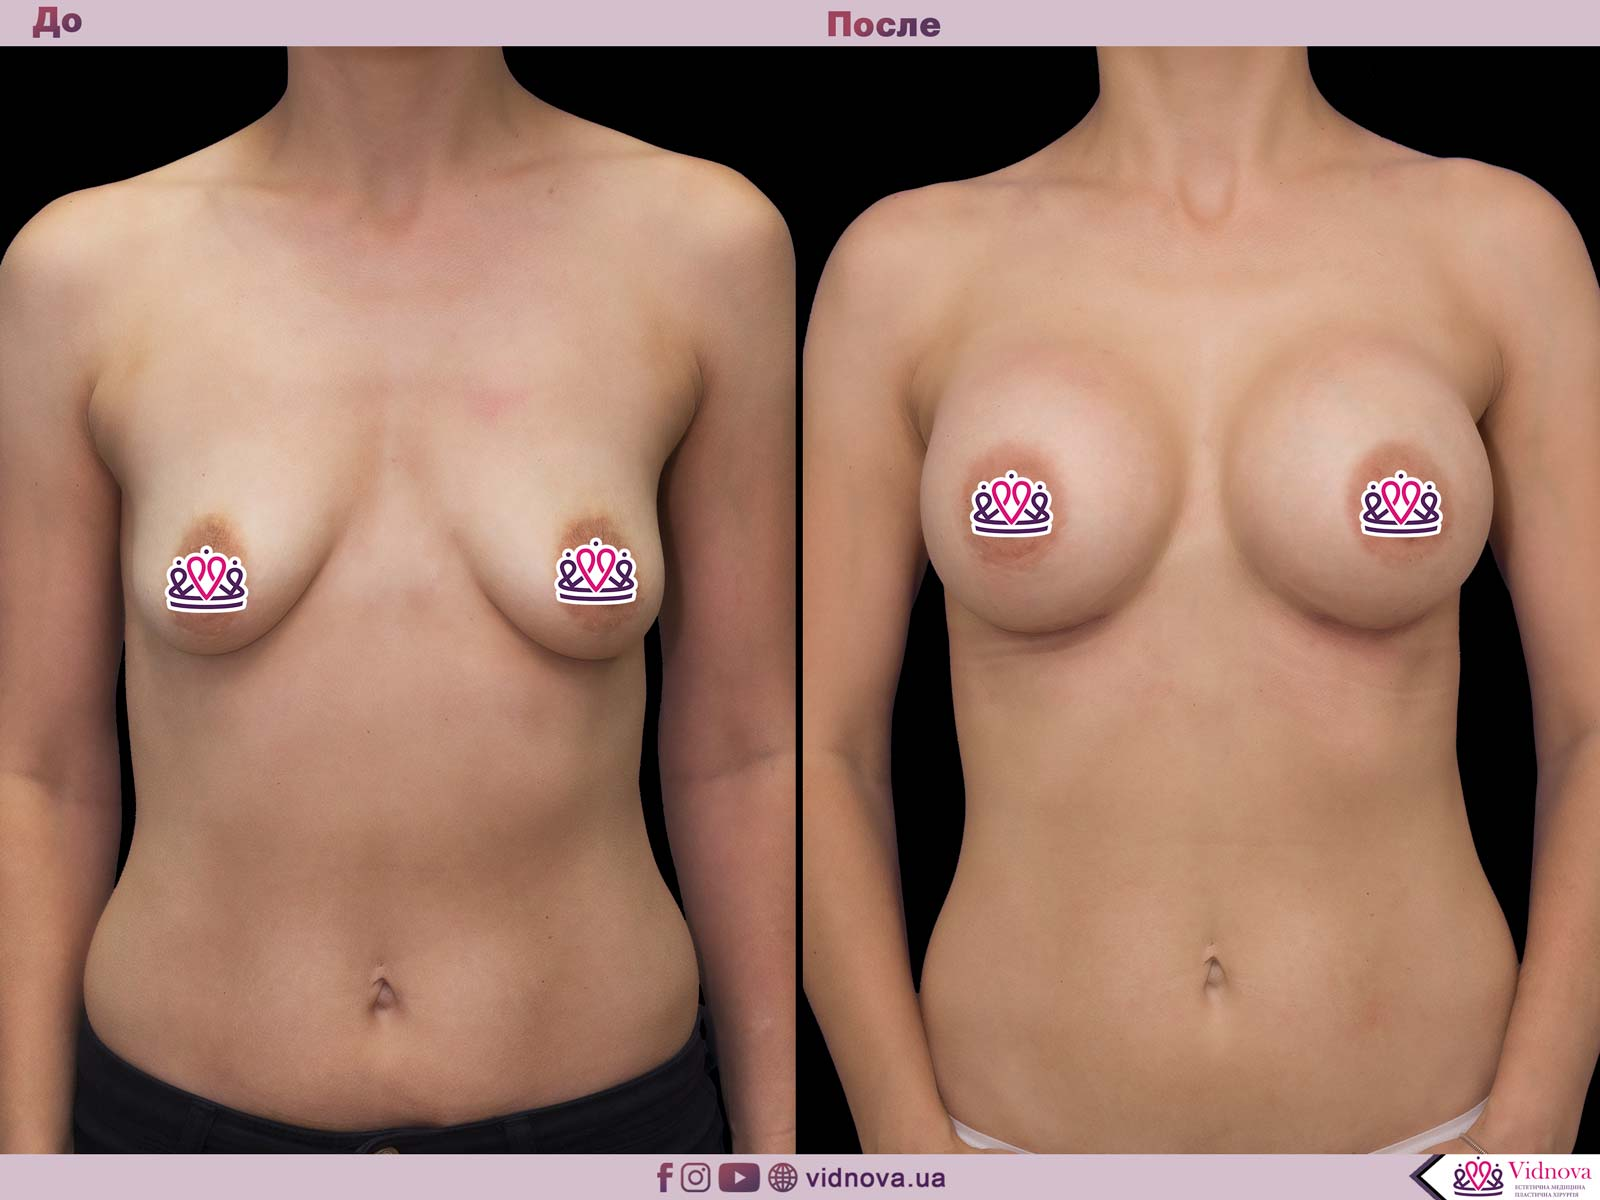 Увеличение груди: Фото ДО и ПОСЛЕ - Пример №47-1 - Клиника Vidnova